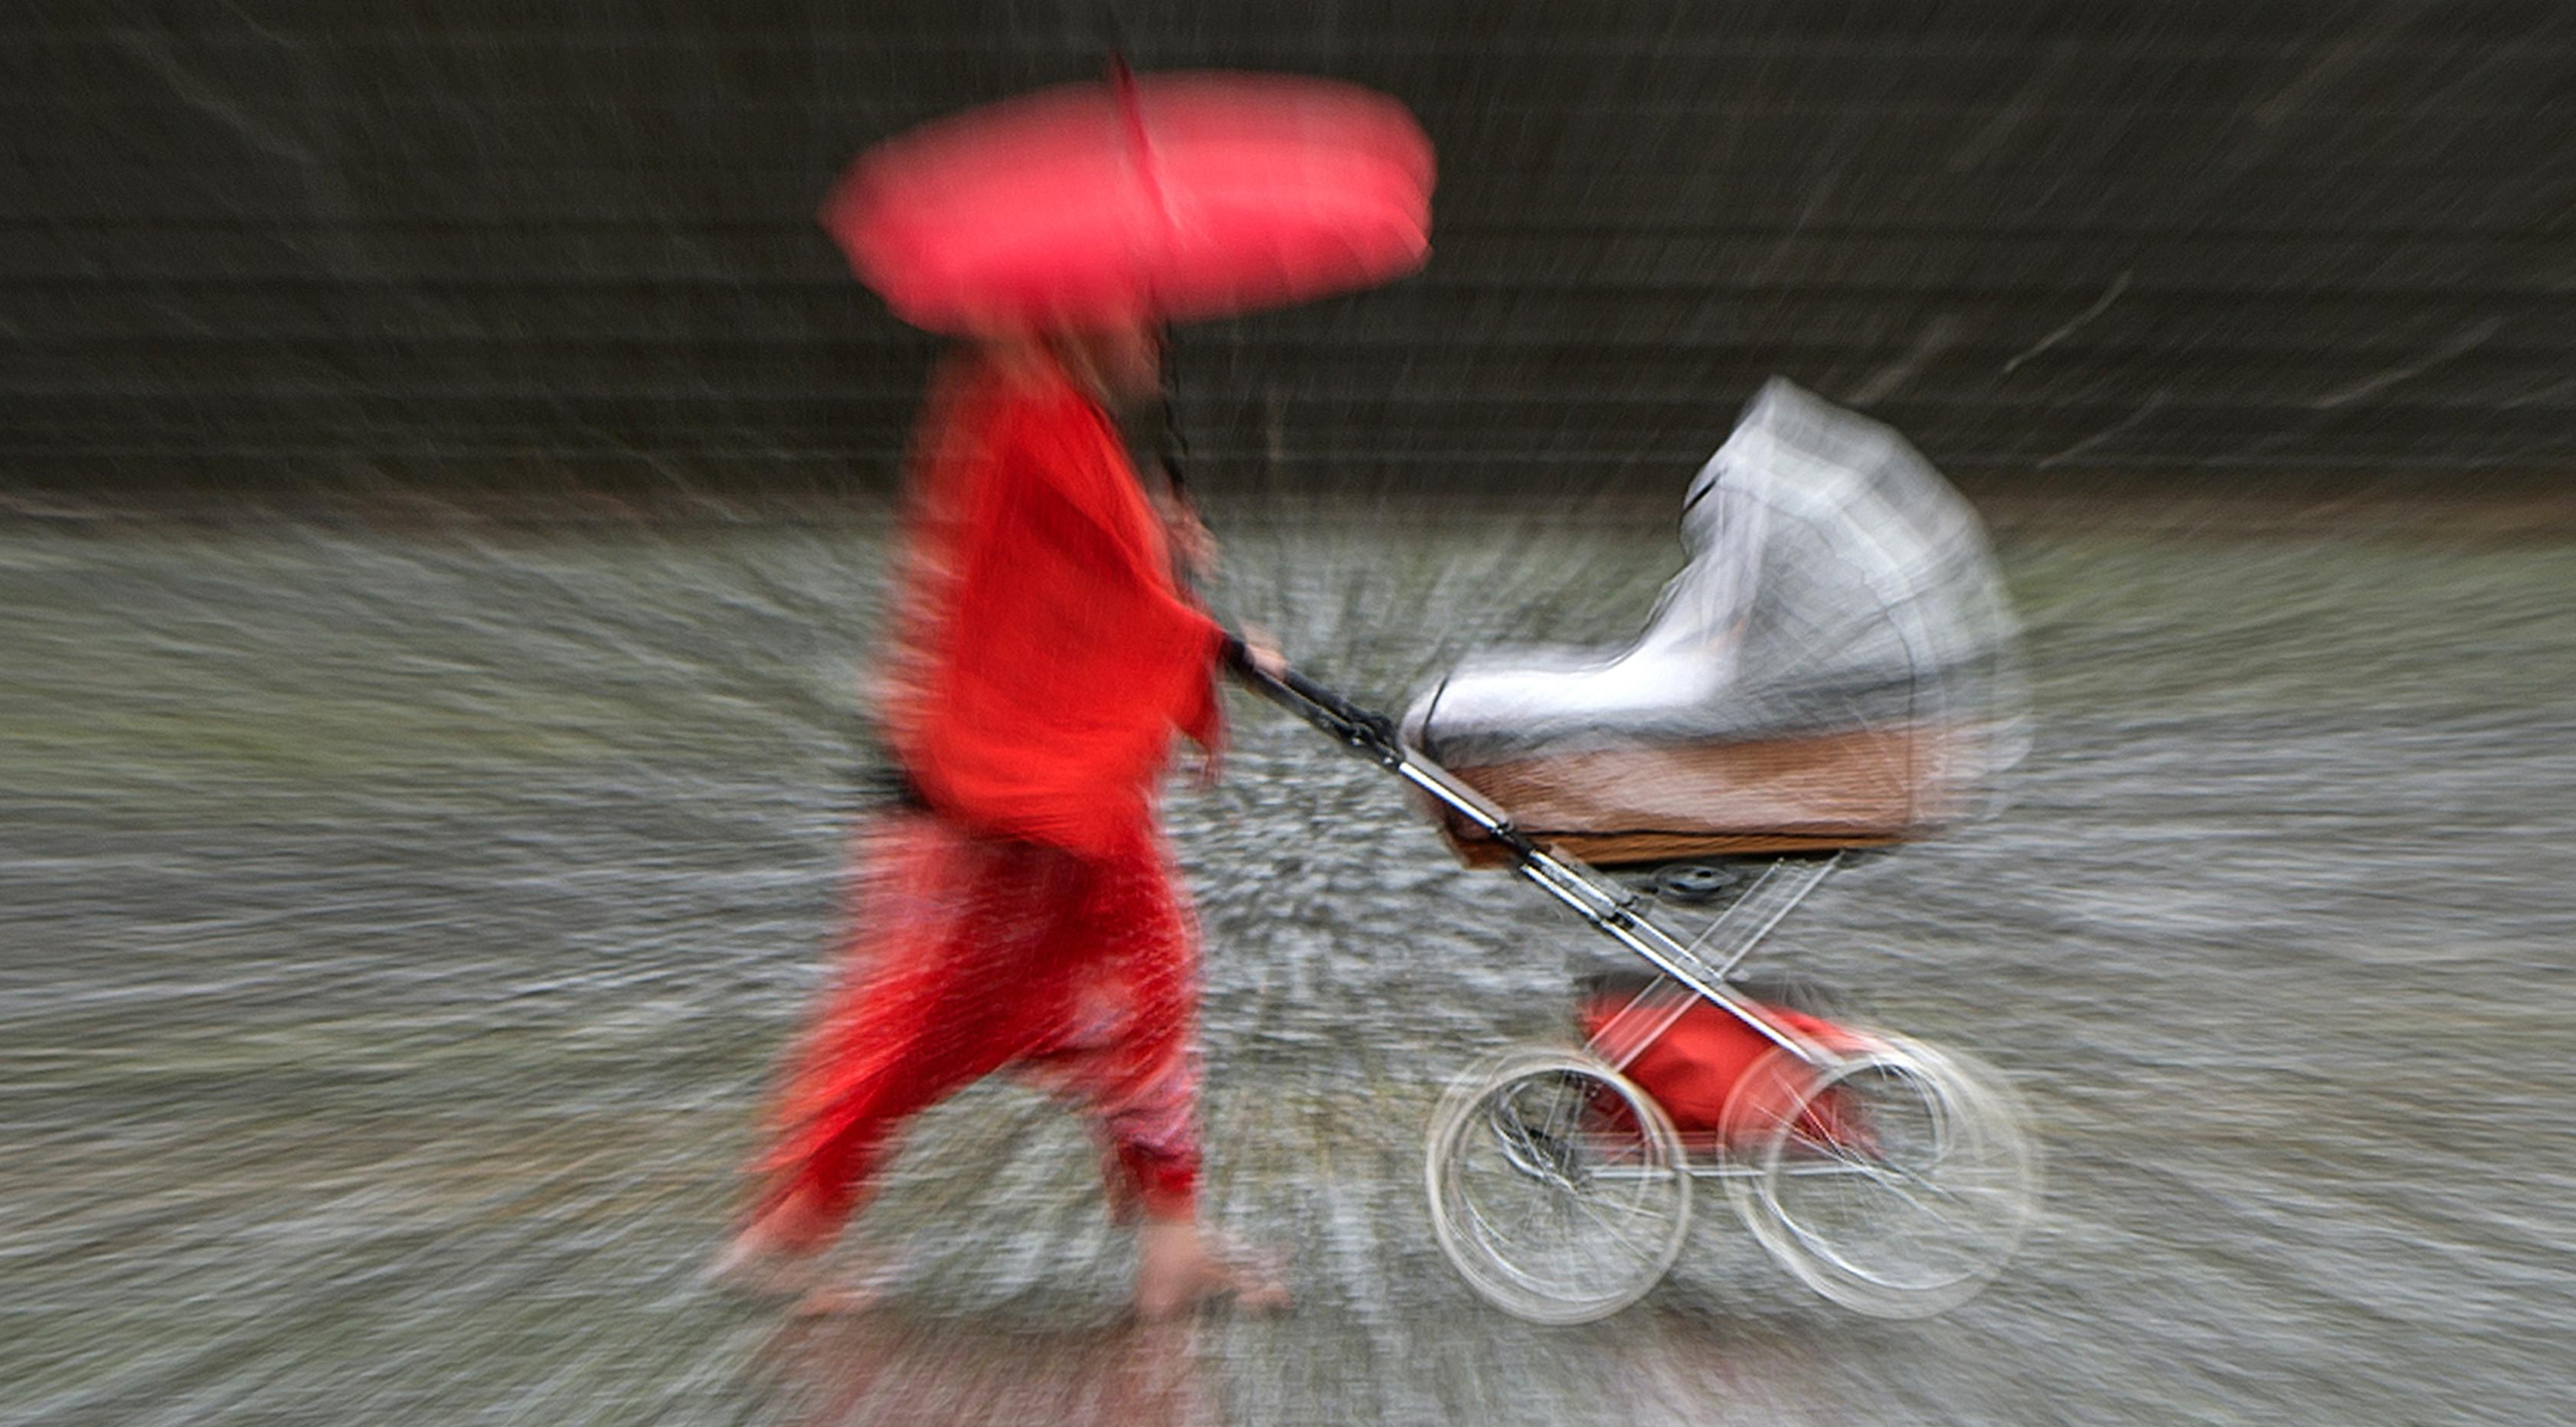 Seorang wanita berjalan selama hujan deras di Erfurt, Jerman, (29/6). Prakiraan cuaca memprediksi dalam beberapa hari Jerman dilanda hujan deras yang mengakibatkan banjir di beberapa titik ibu kota. (AP Photo / Jens Meyer)